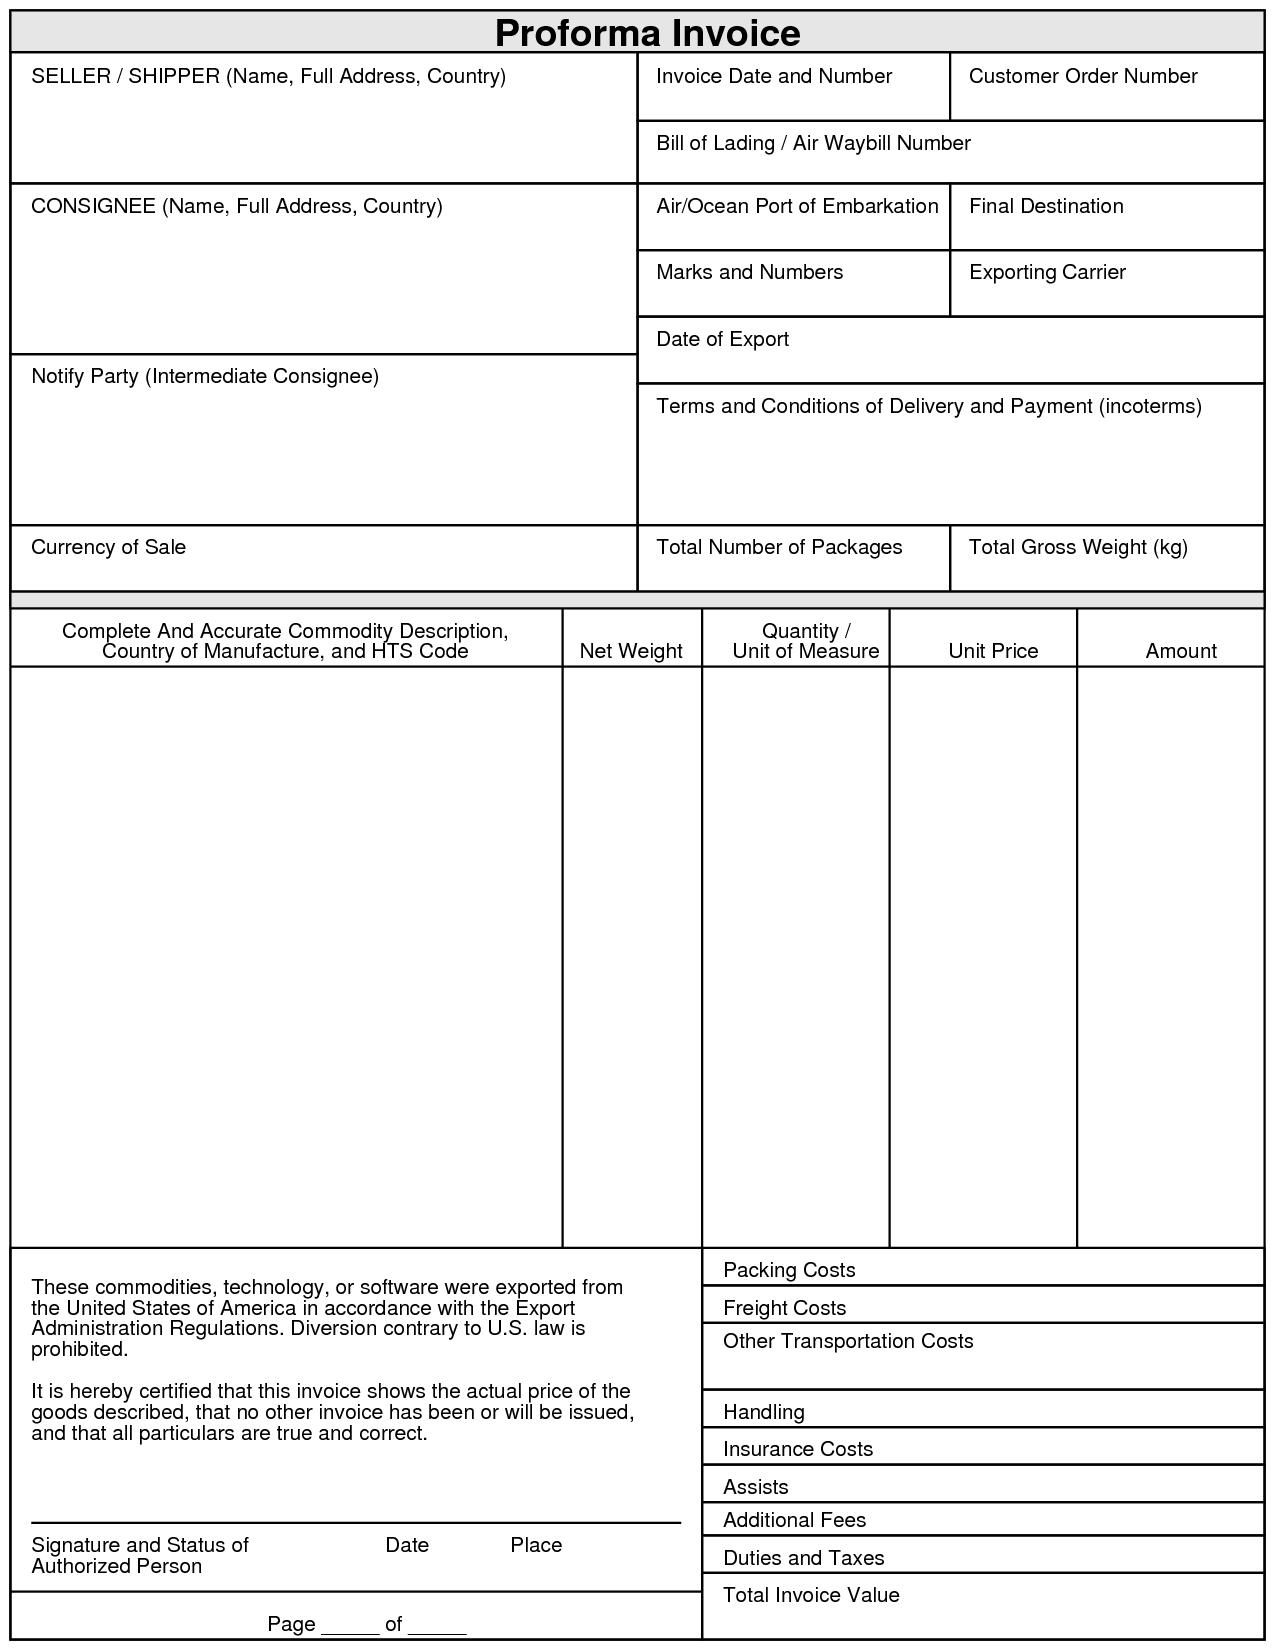 Proforma Invoice Template Pdf